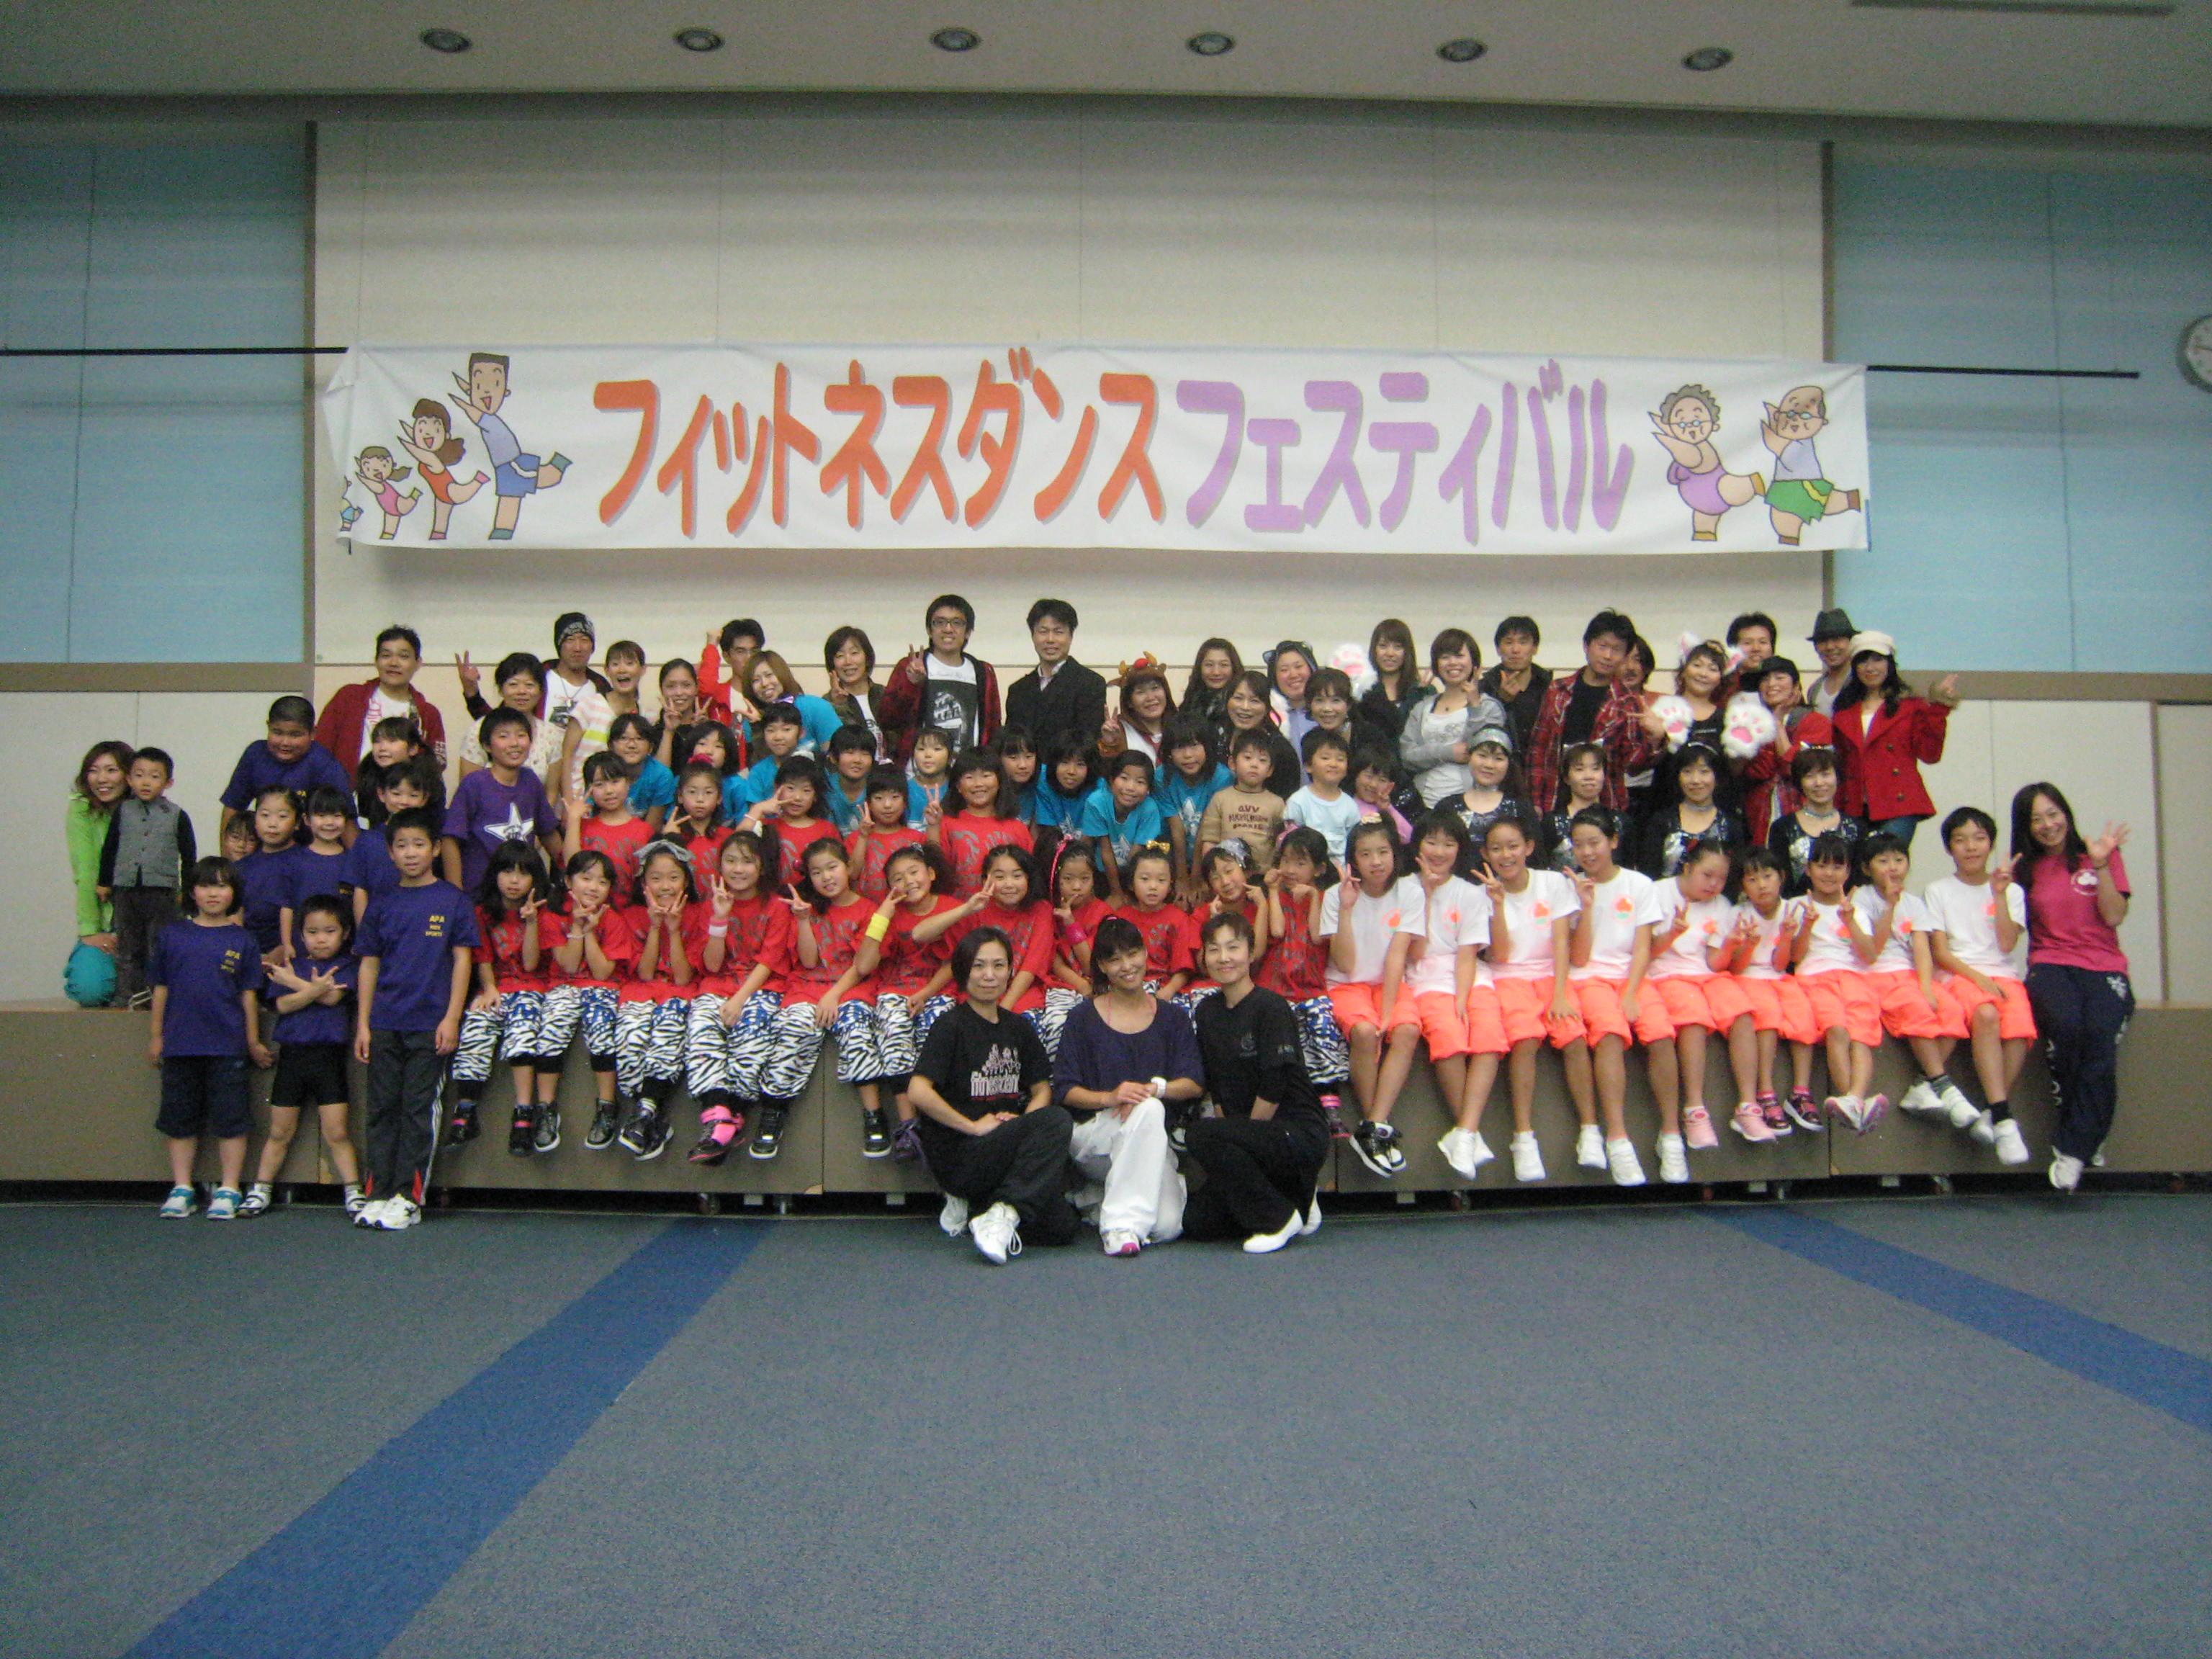 http://www.jafanet.jp/event/%E5%AF%8C%E5%B1%B1.JPG